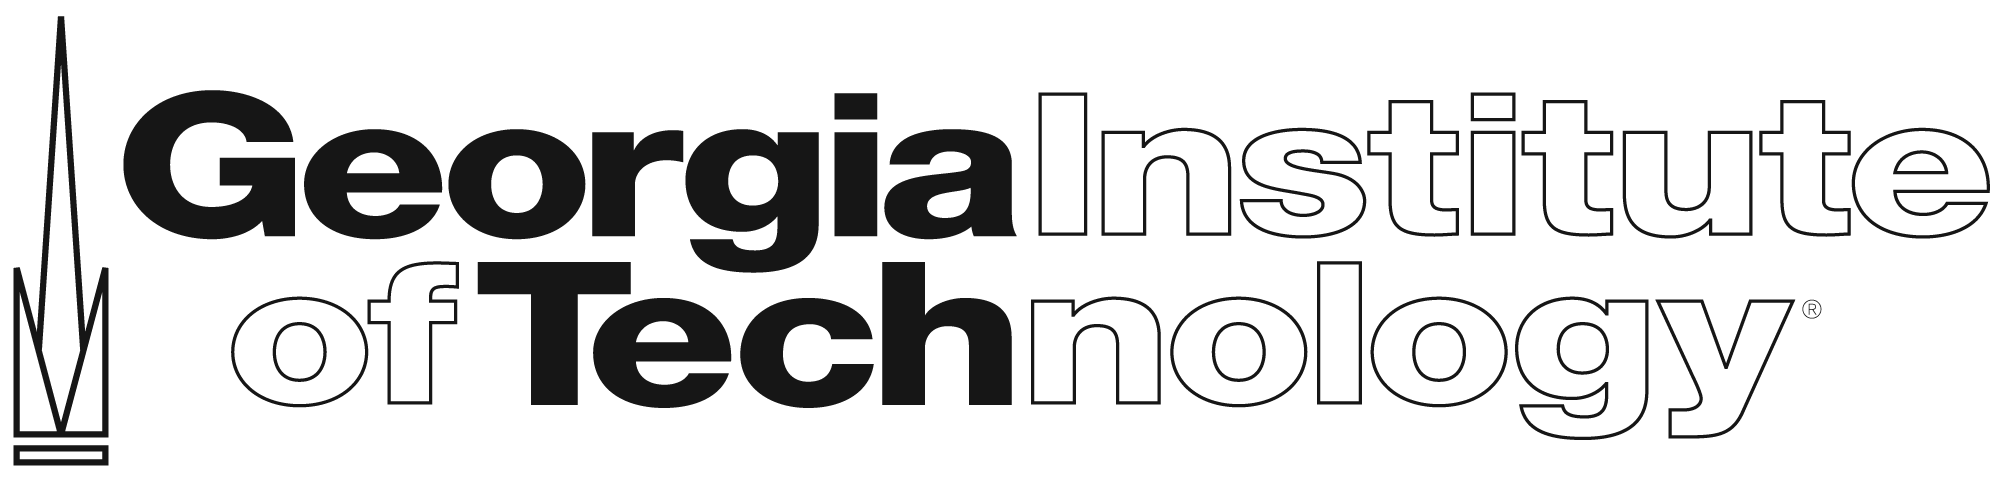 GeorgiaTech1.png